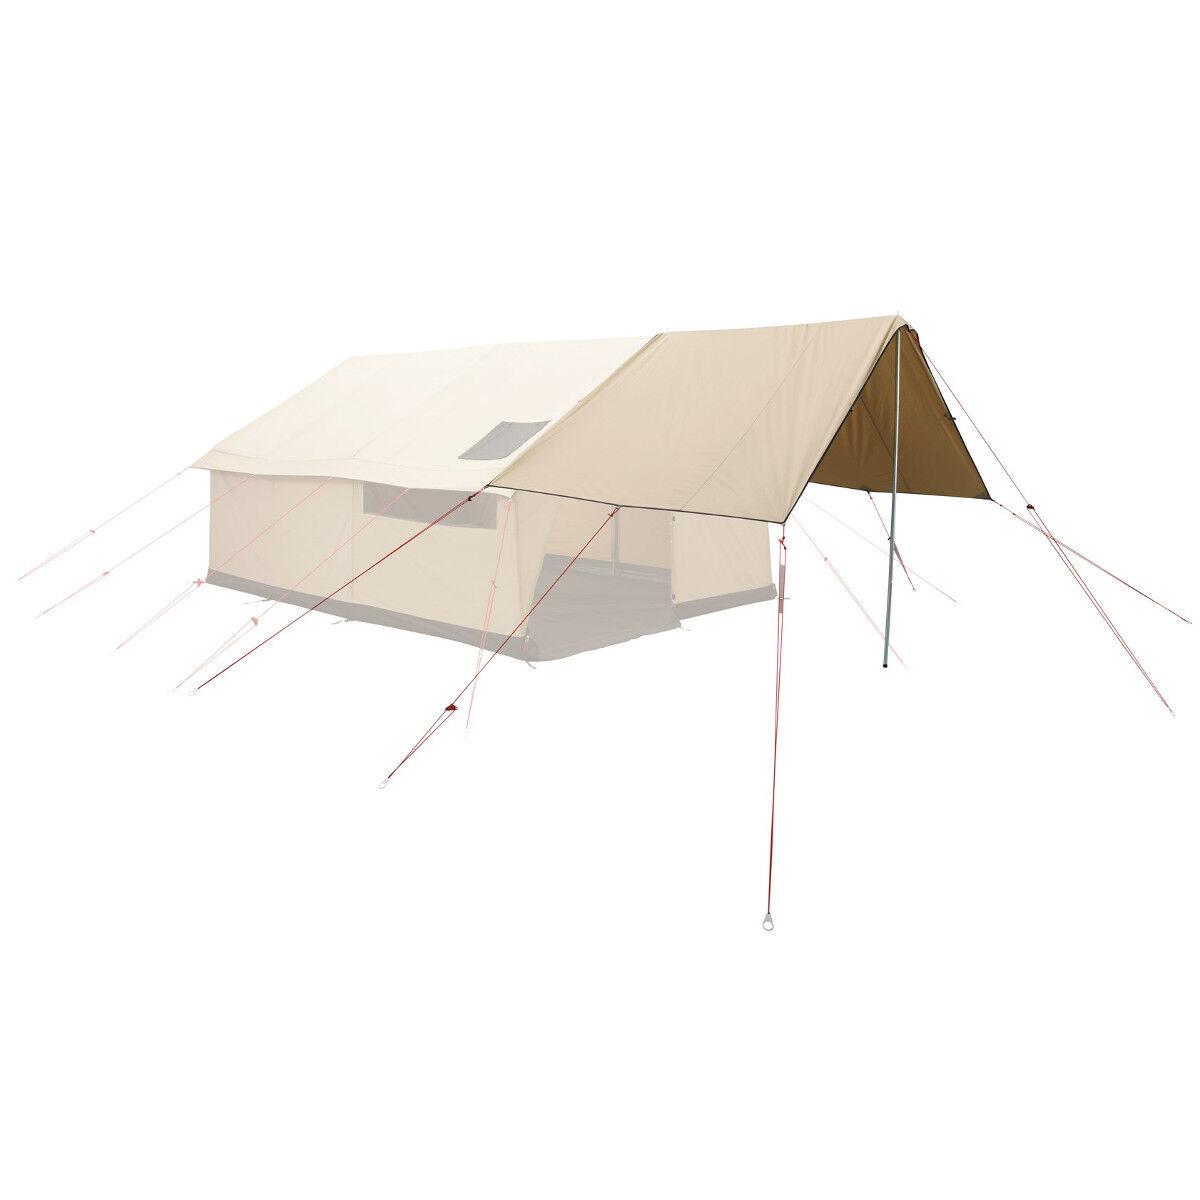 Robens Prospector Tarp | GetCamping